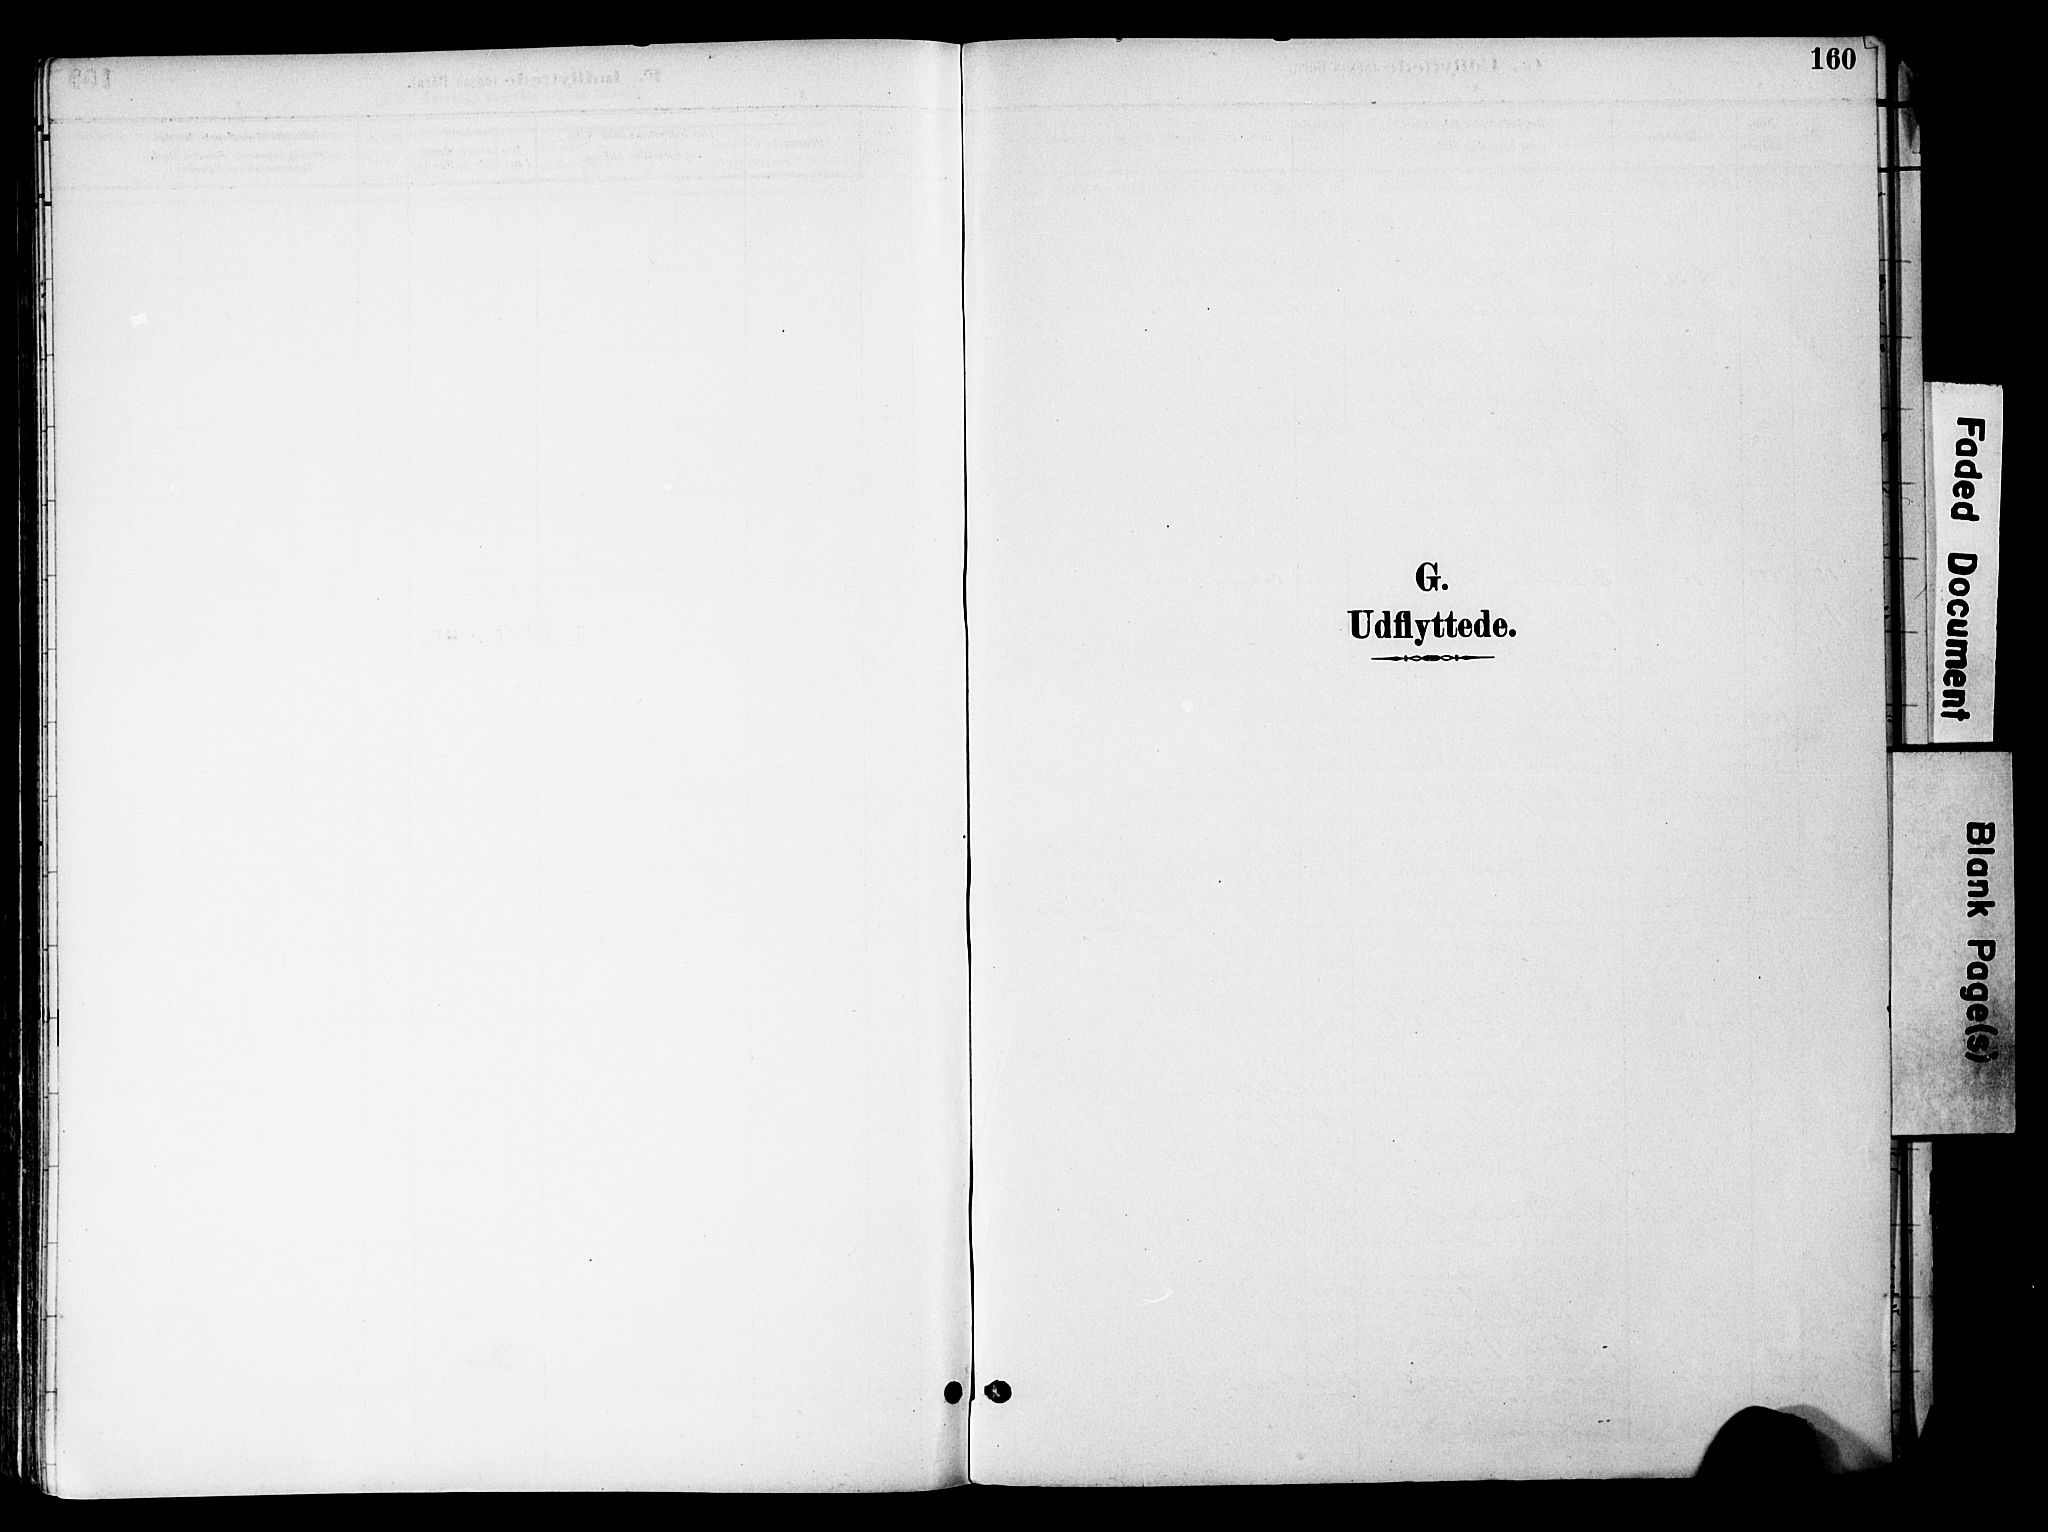 SAH, Gran prestekontor, Ministerialbok nr. 20, 1889-1899, s. 160